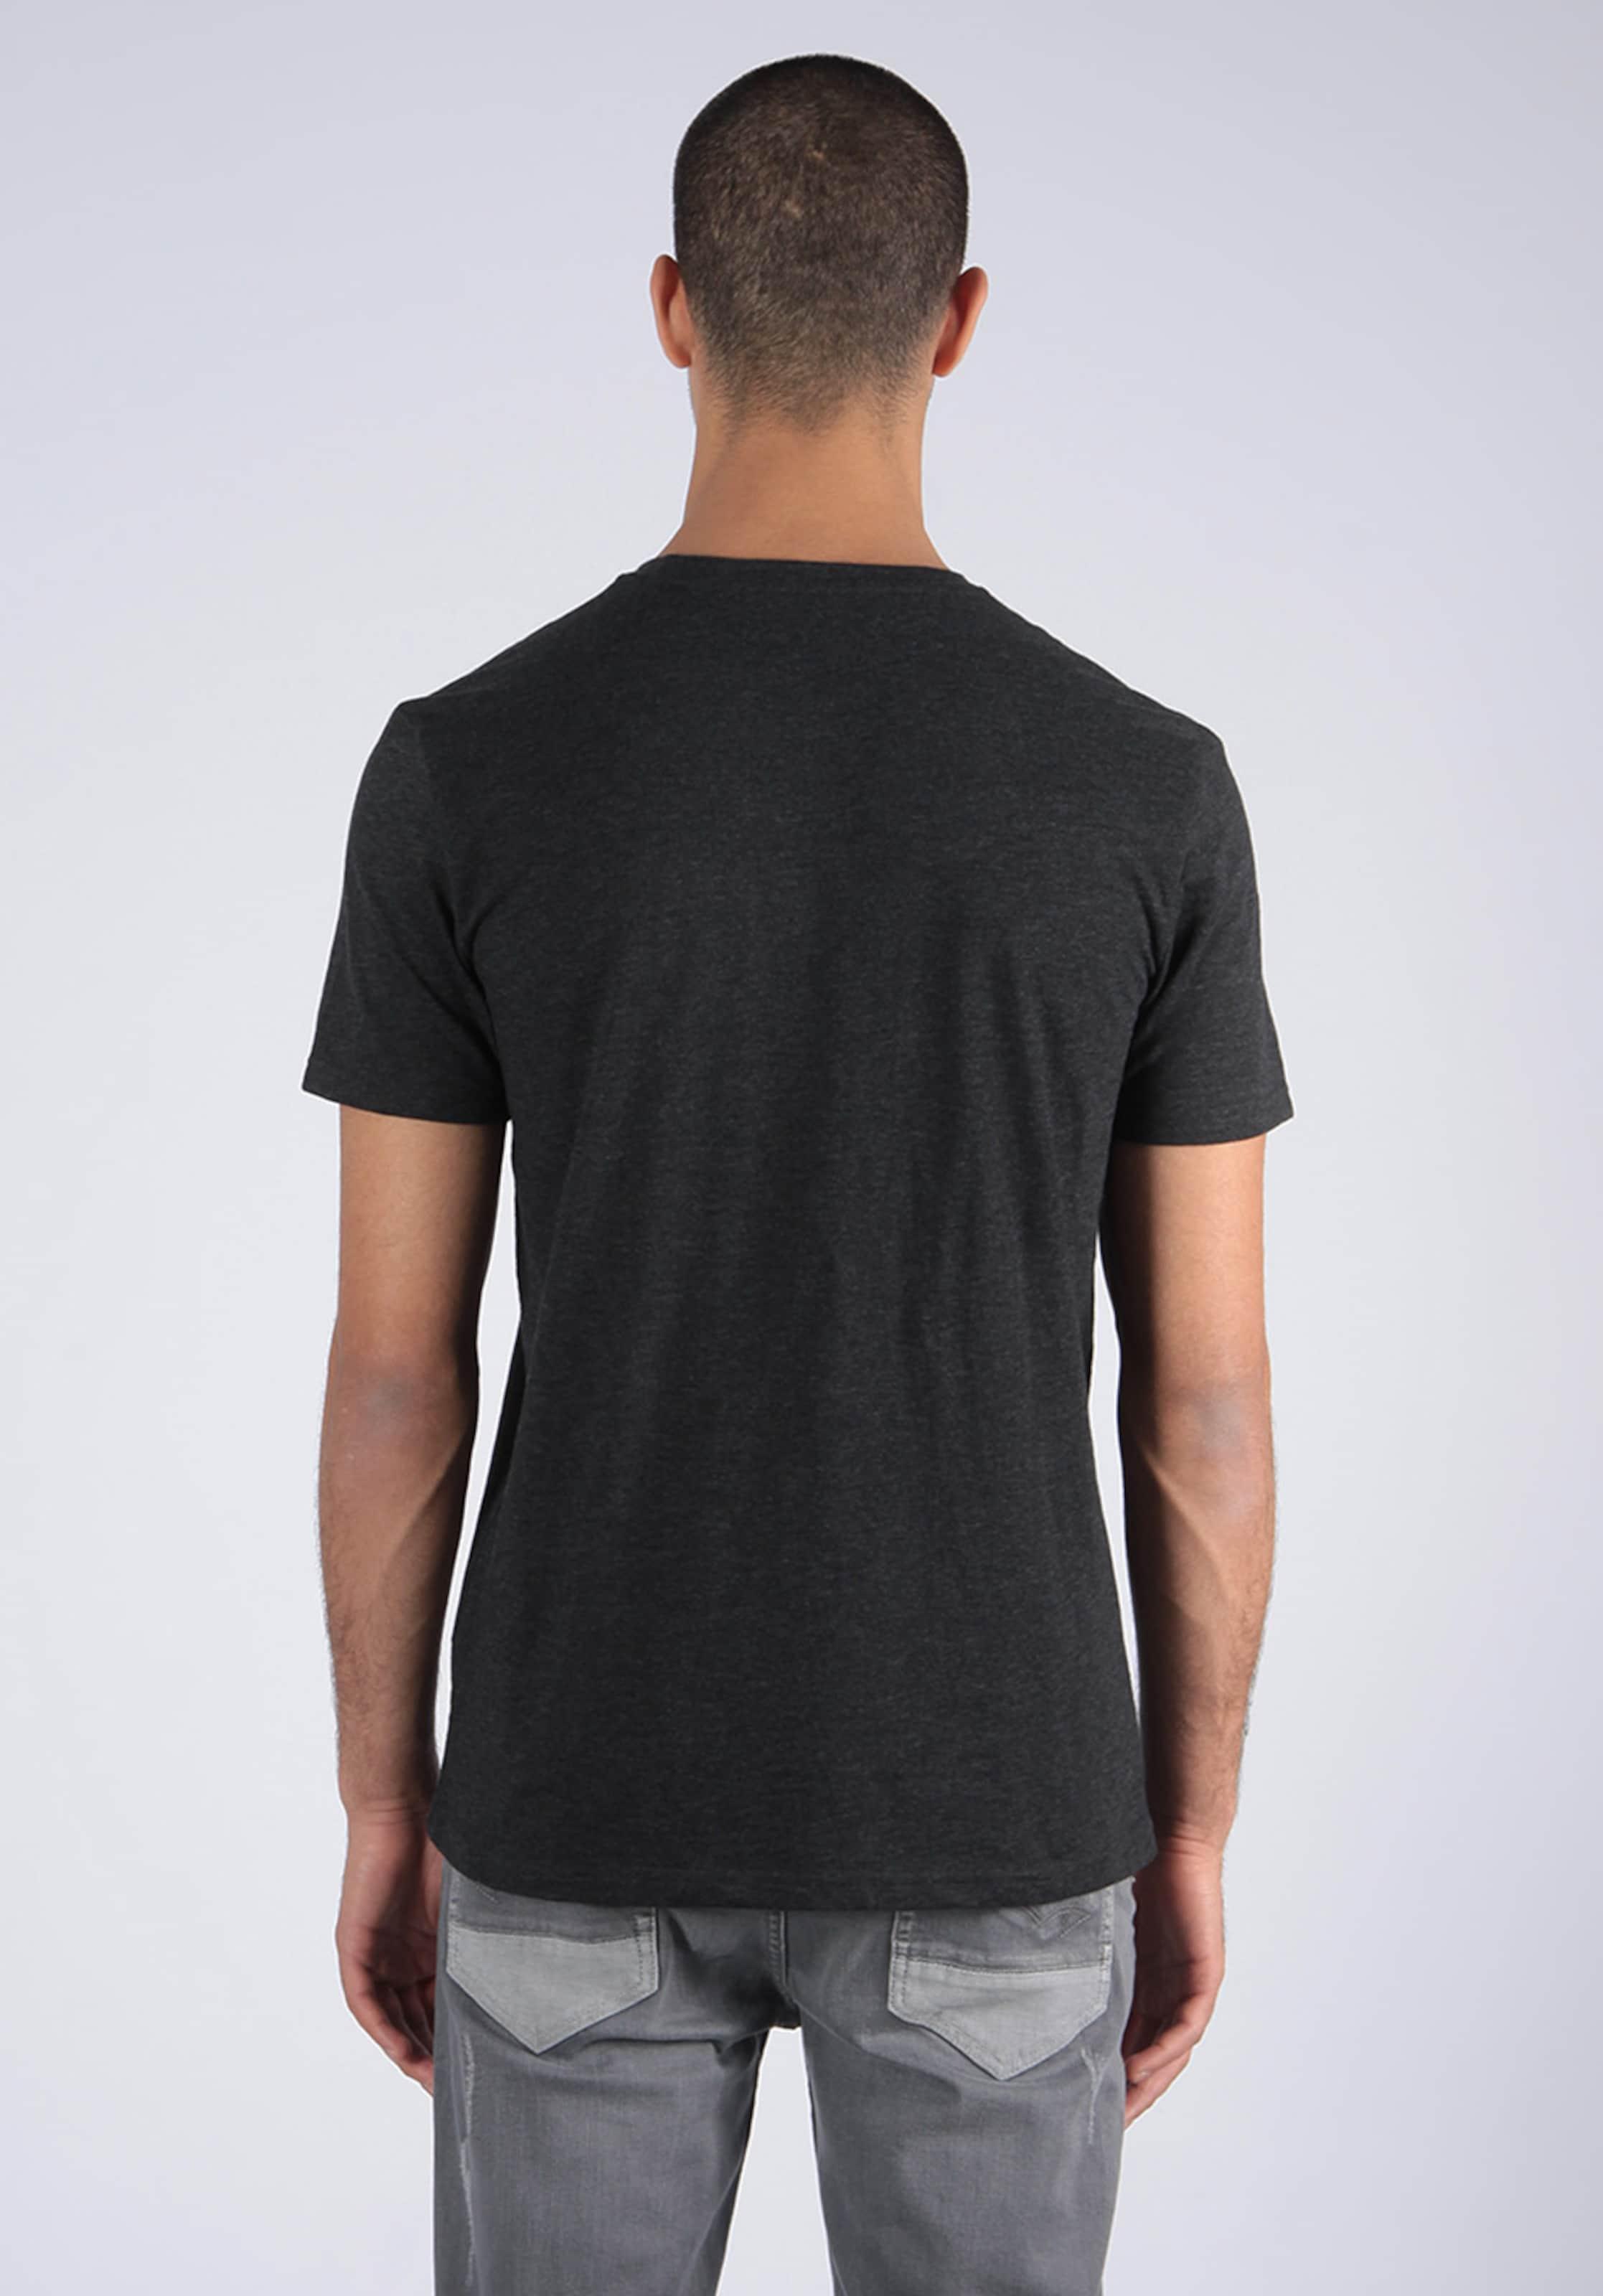 shirt In 'ritch HellgrauSchwarz T Kaporal Blacme' sordhtQxCB